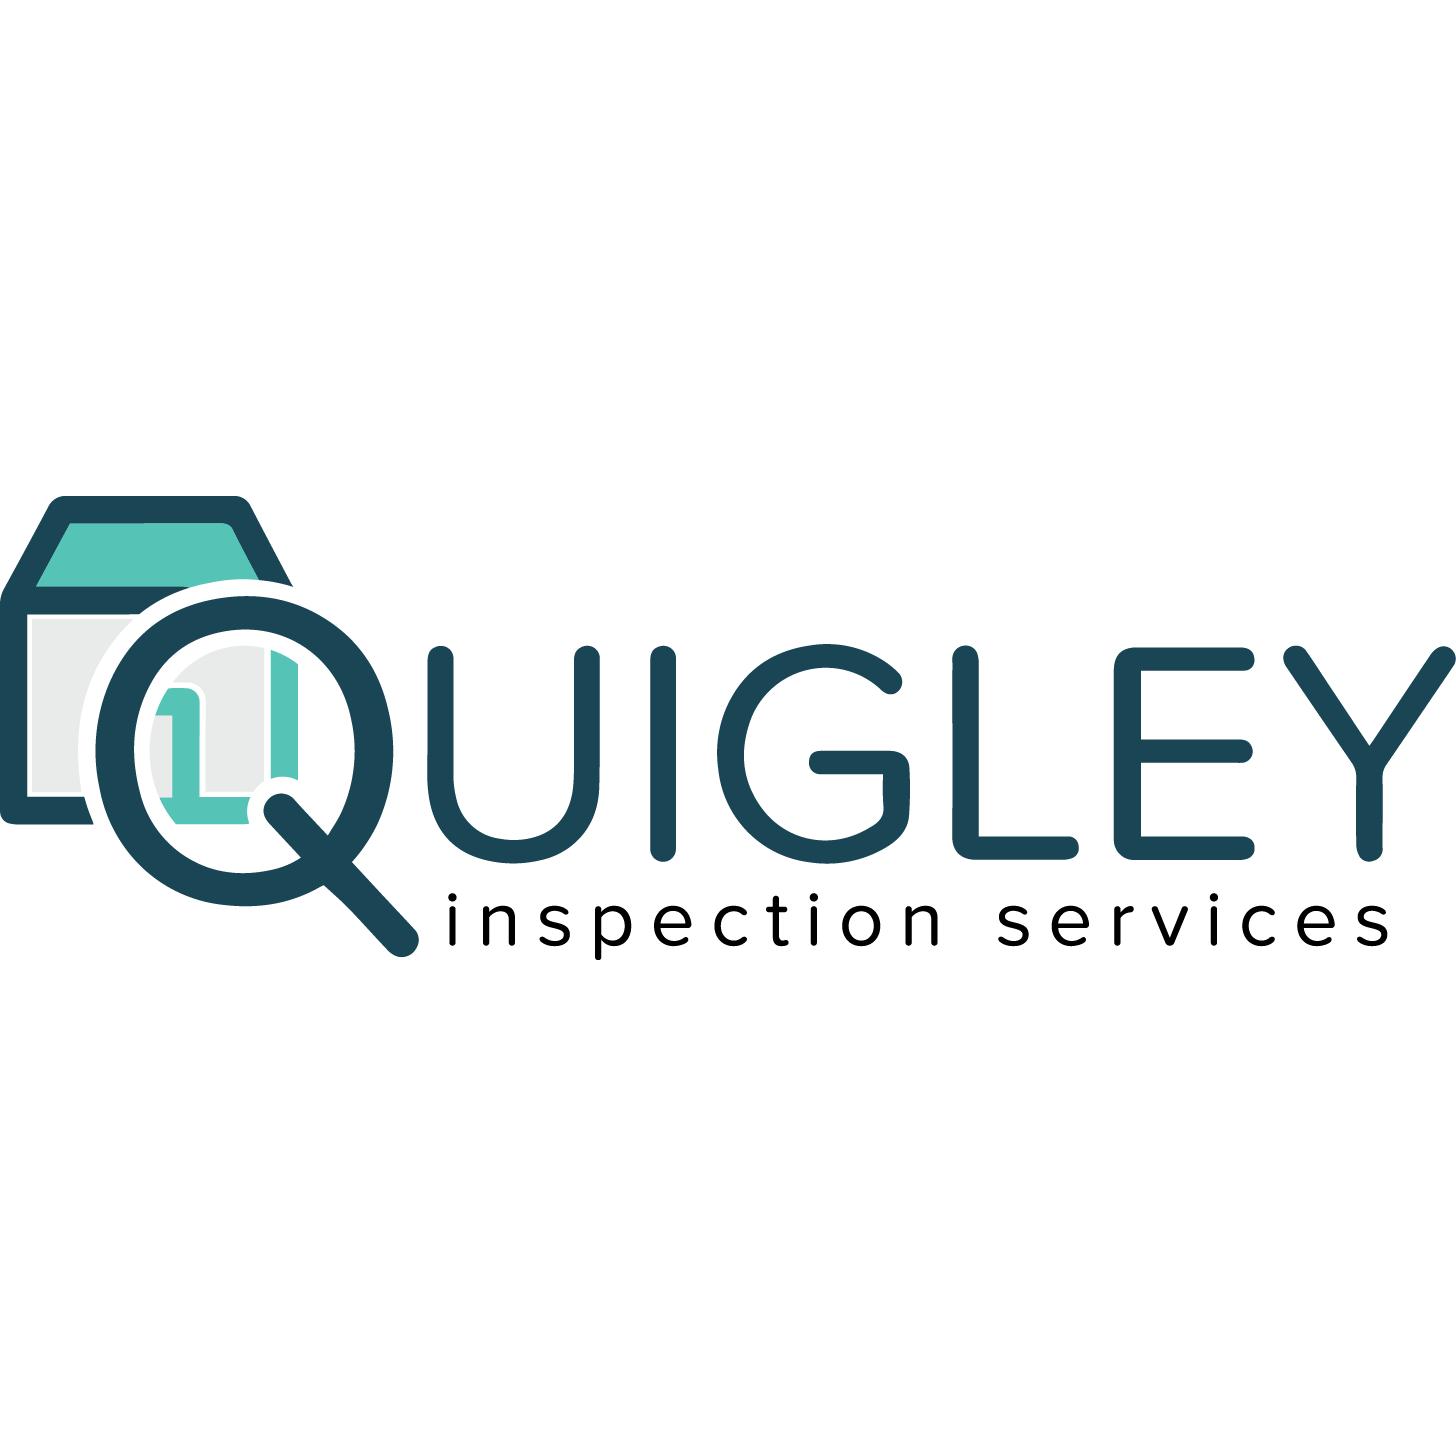 Quigley Inspection Services - Saint Petersburg, FL - Home Inspectors